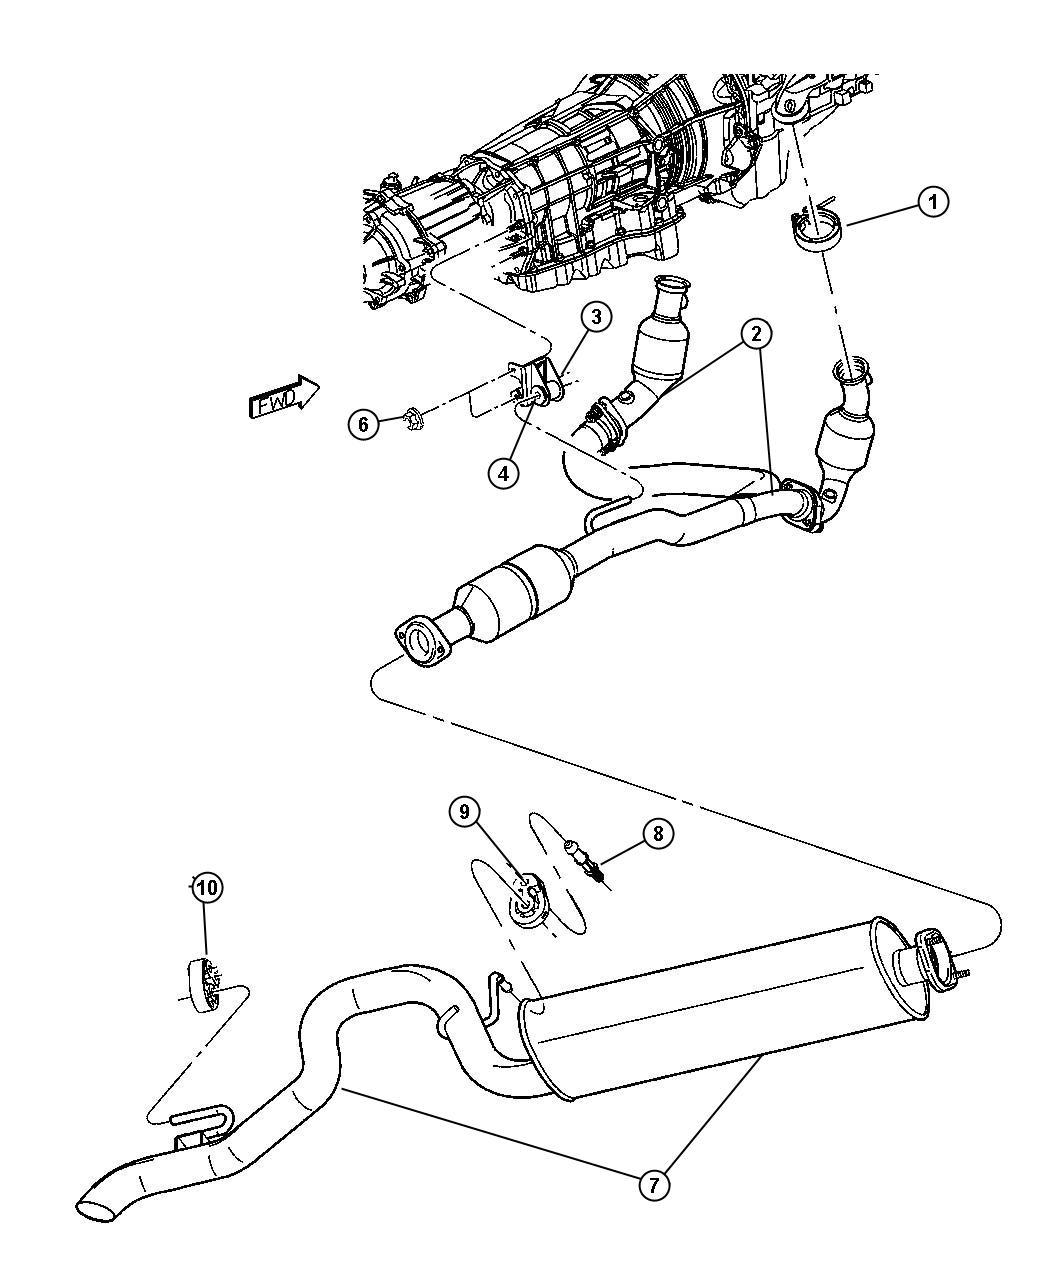 1999 grand cherokee stereo wiring diagram 28   wiring diagram for 1999 jeep grand cherokee   2001 jeep  jeep grand cherokee